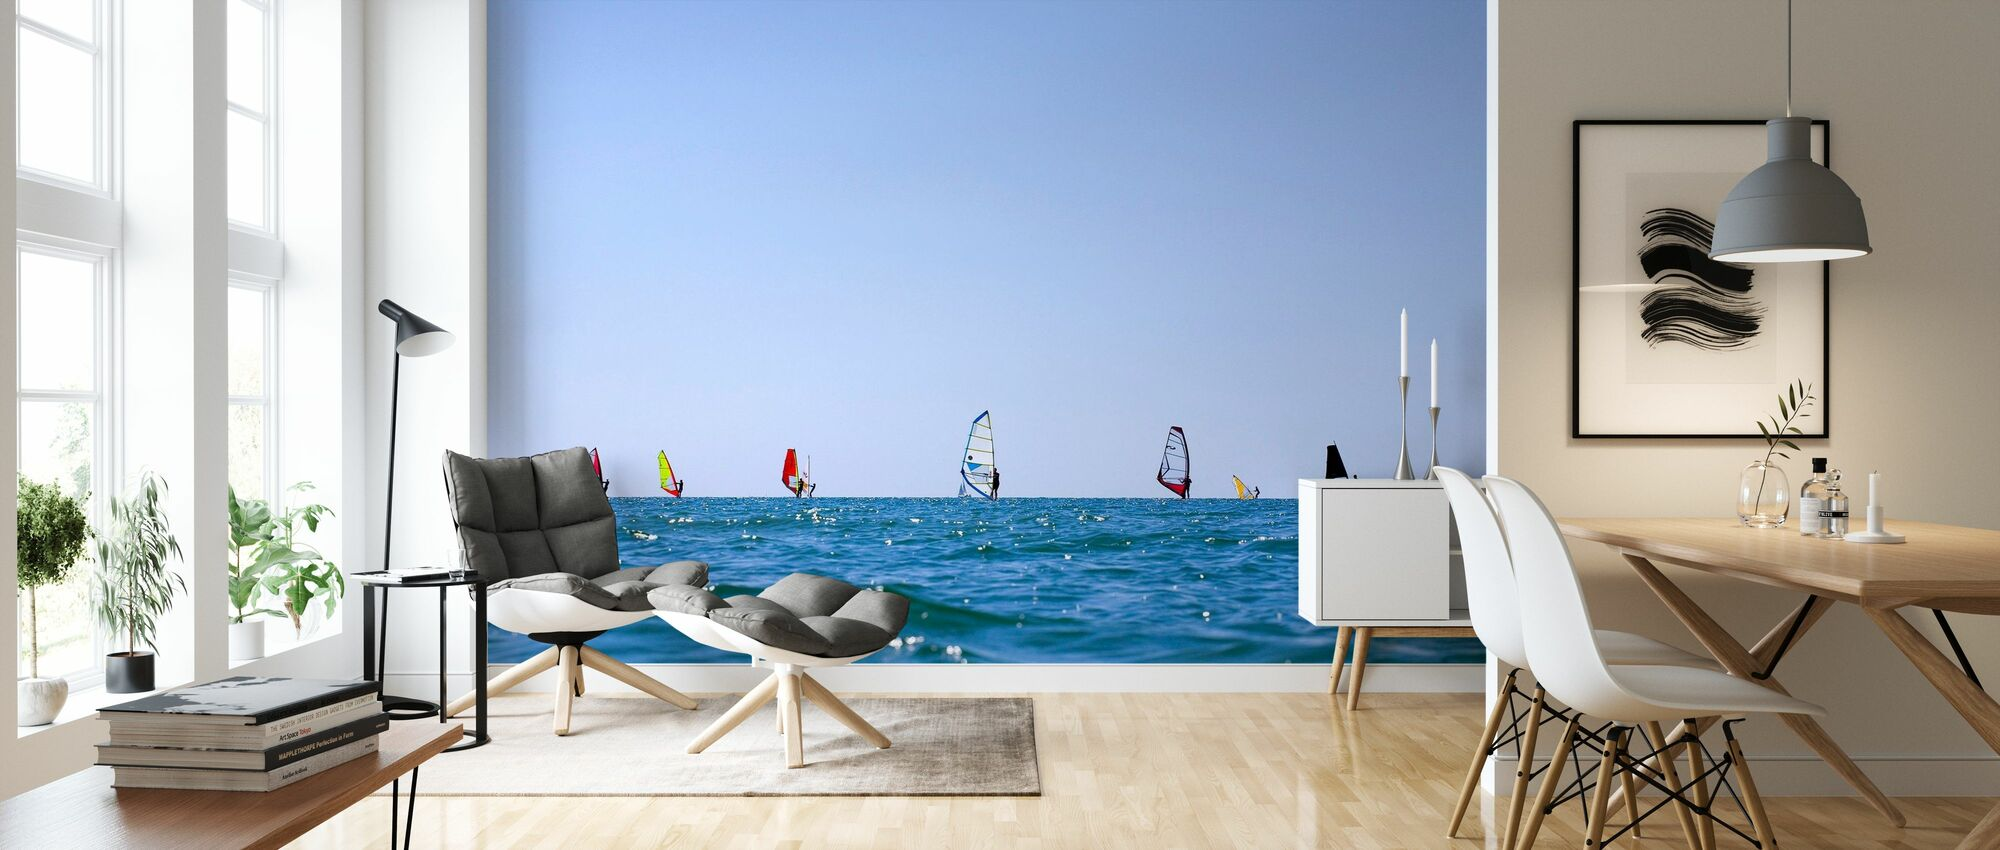 Windsurfing in Varberg, Sweden - Wallpaper - Living Room